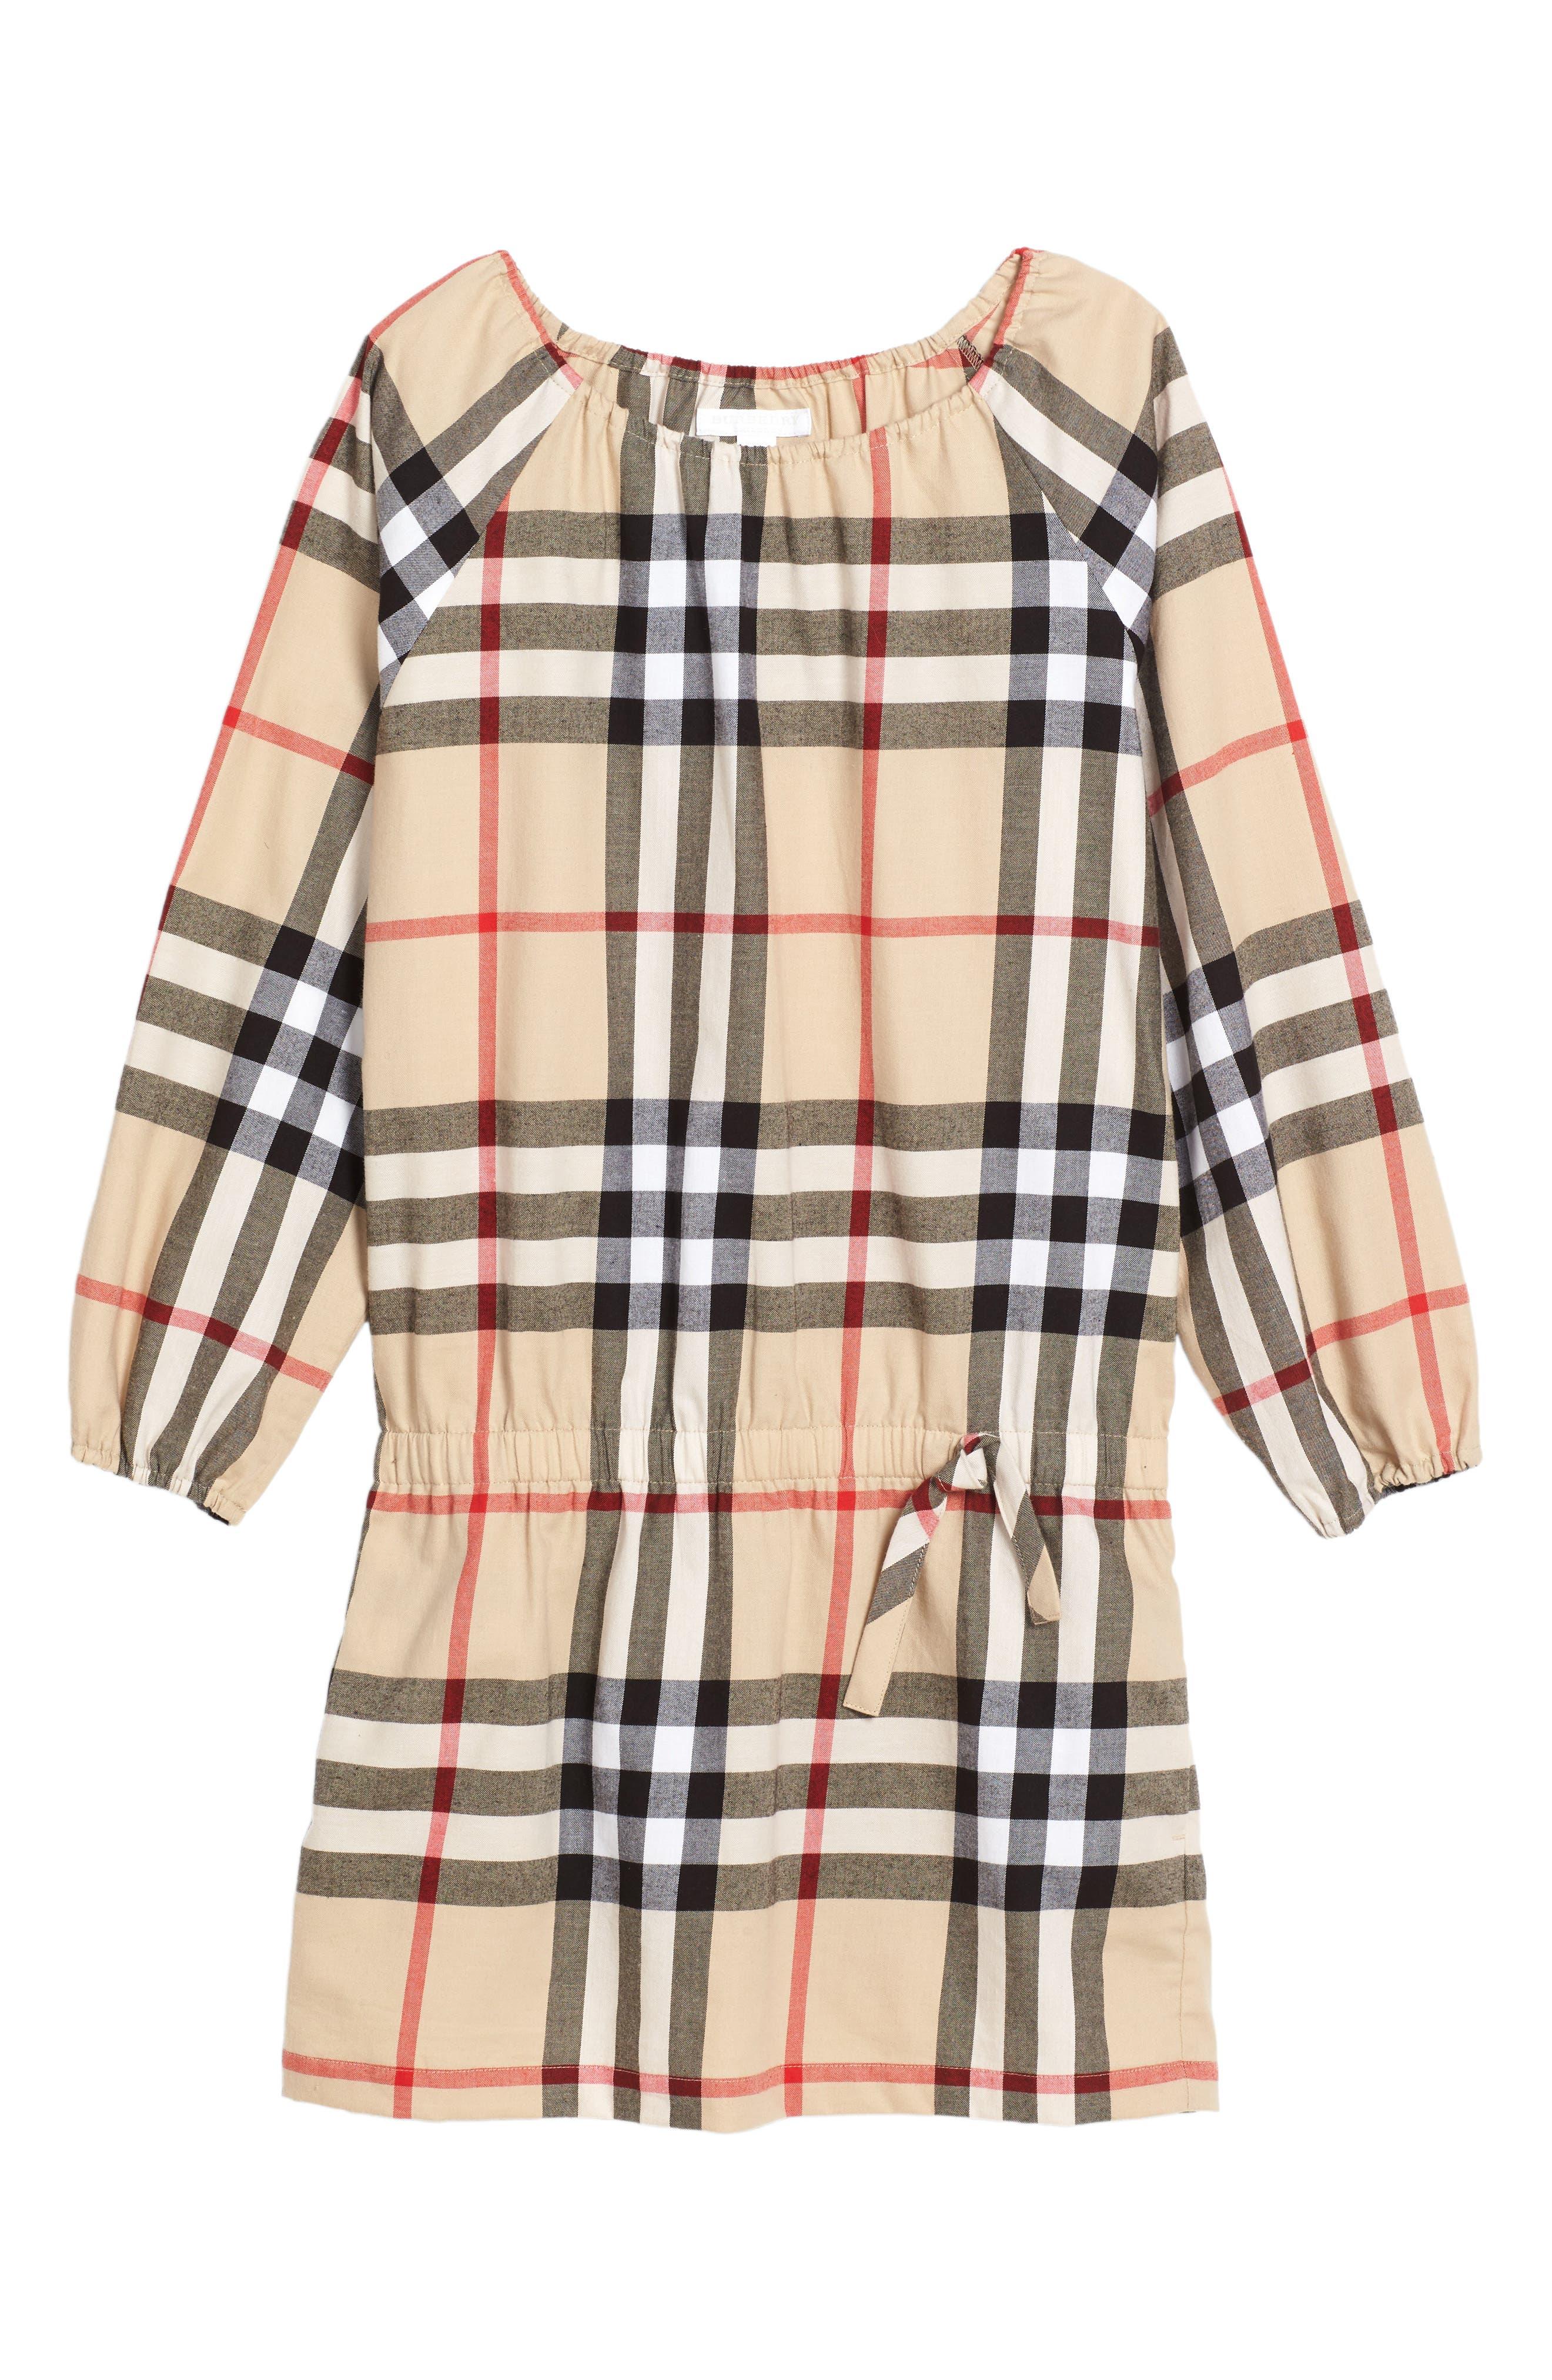 Alternate Image 1 Selected - Burberry Kadyann Check Dress (Little Girls & Big Girls)